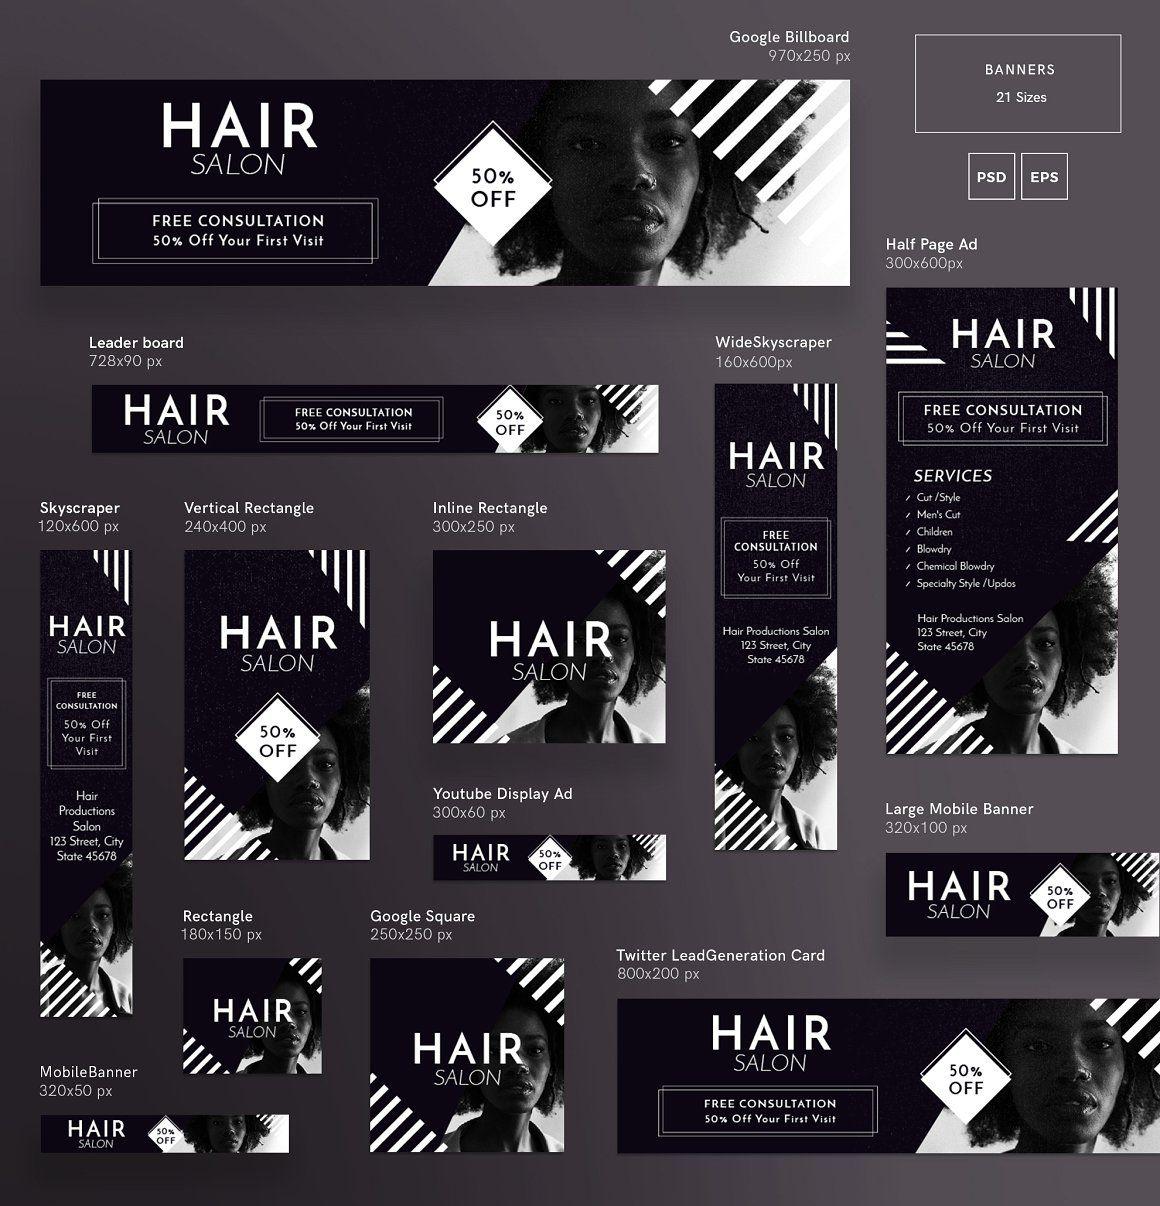 Mega Bundle Hair Salon Web Banner Design Banner Design Inspiration Banner Ads Design